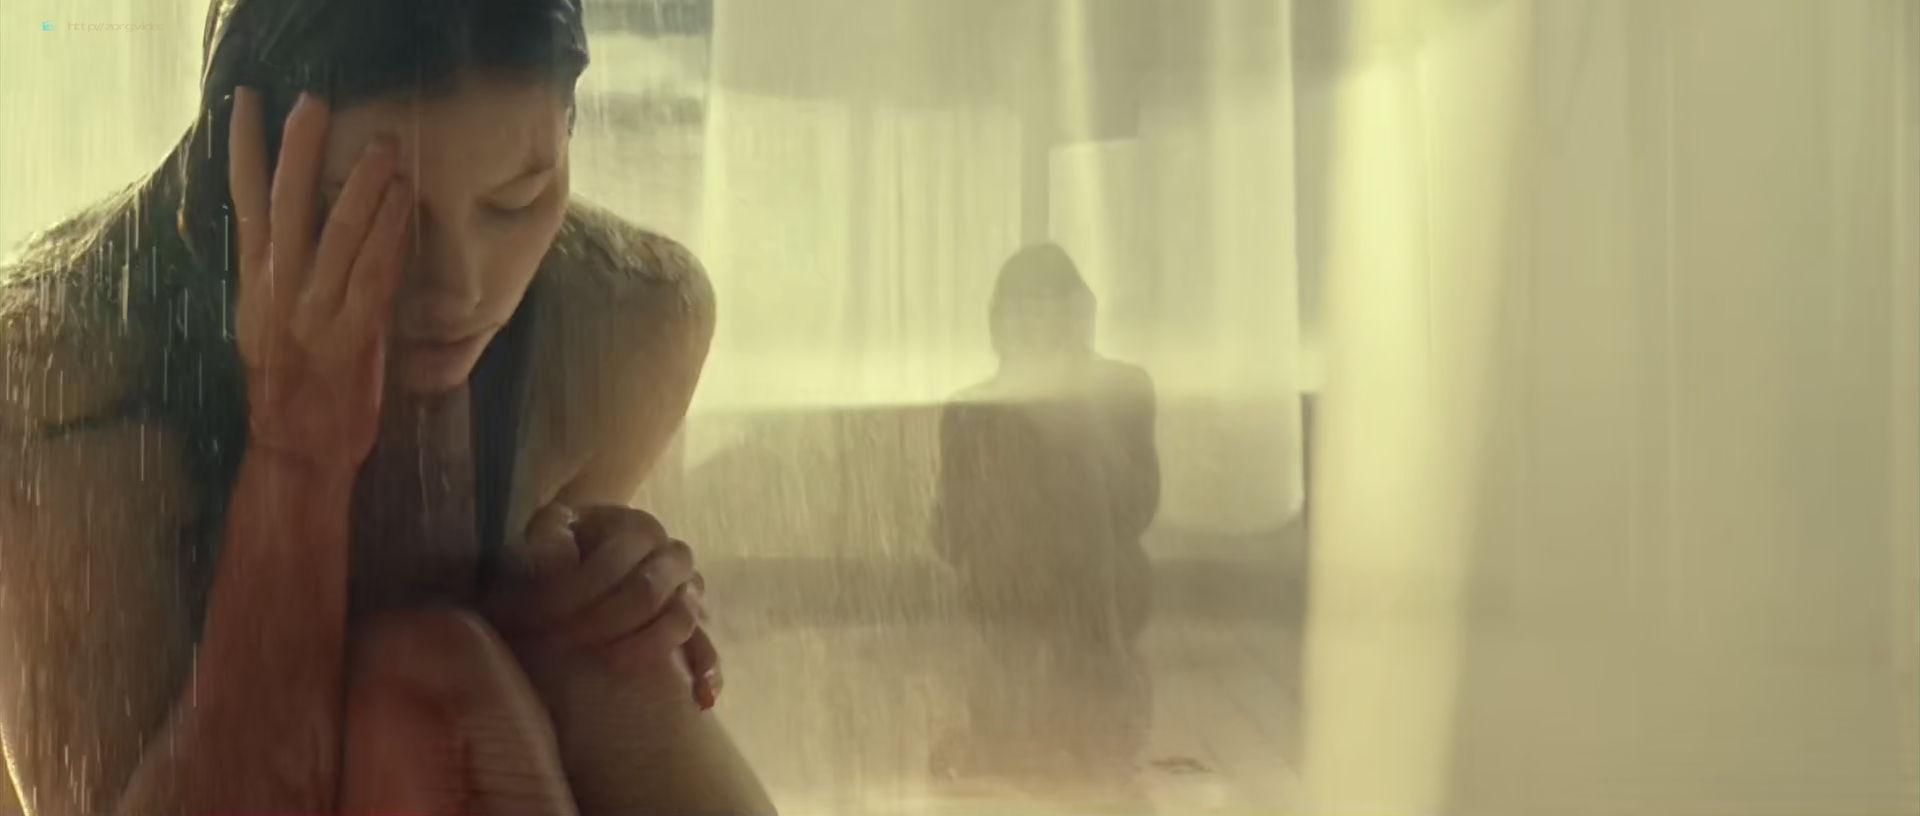 Jessica Biel hot and sexy - Blade Trinity (2004) HD 1080p BluRay (12)